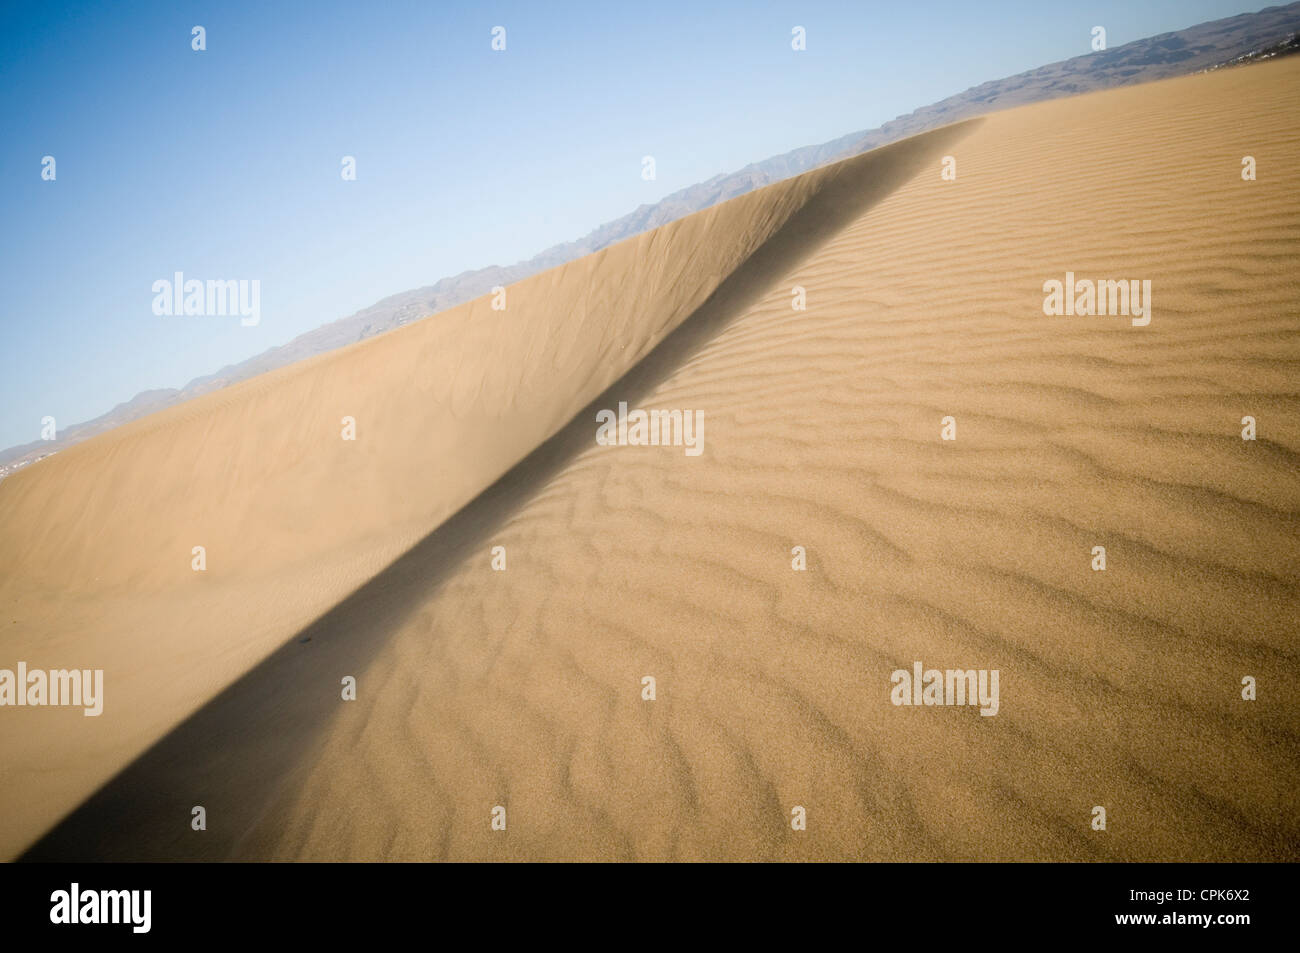 Maspalomas Gran Canaria Düne Dünen Wind geblasen trockenen Wüste Wüsten Orte der Strand Strände Playa Del Ingles Stockfoto